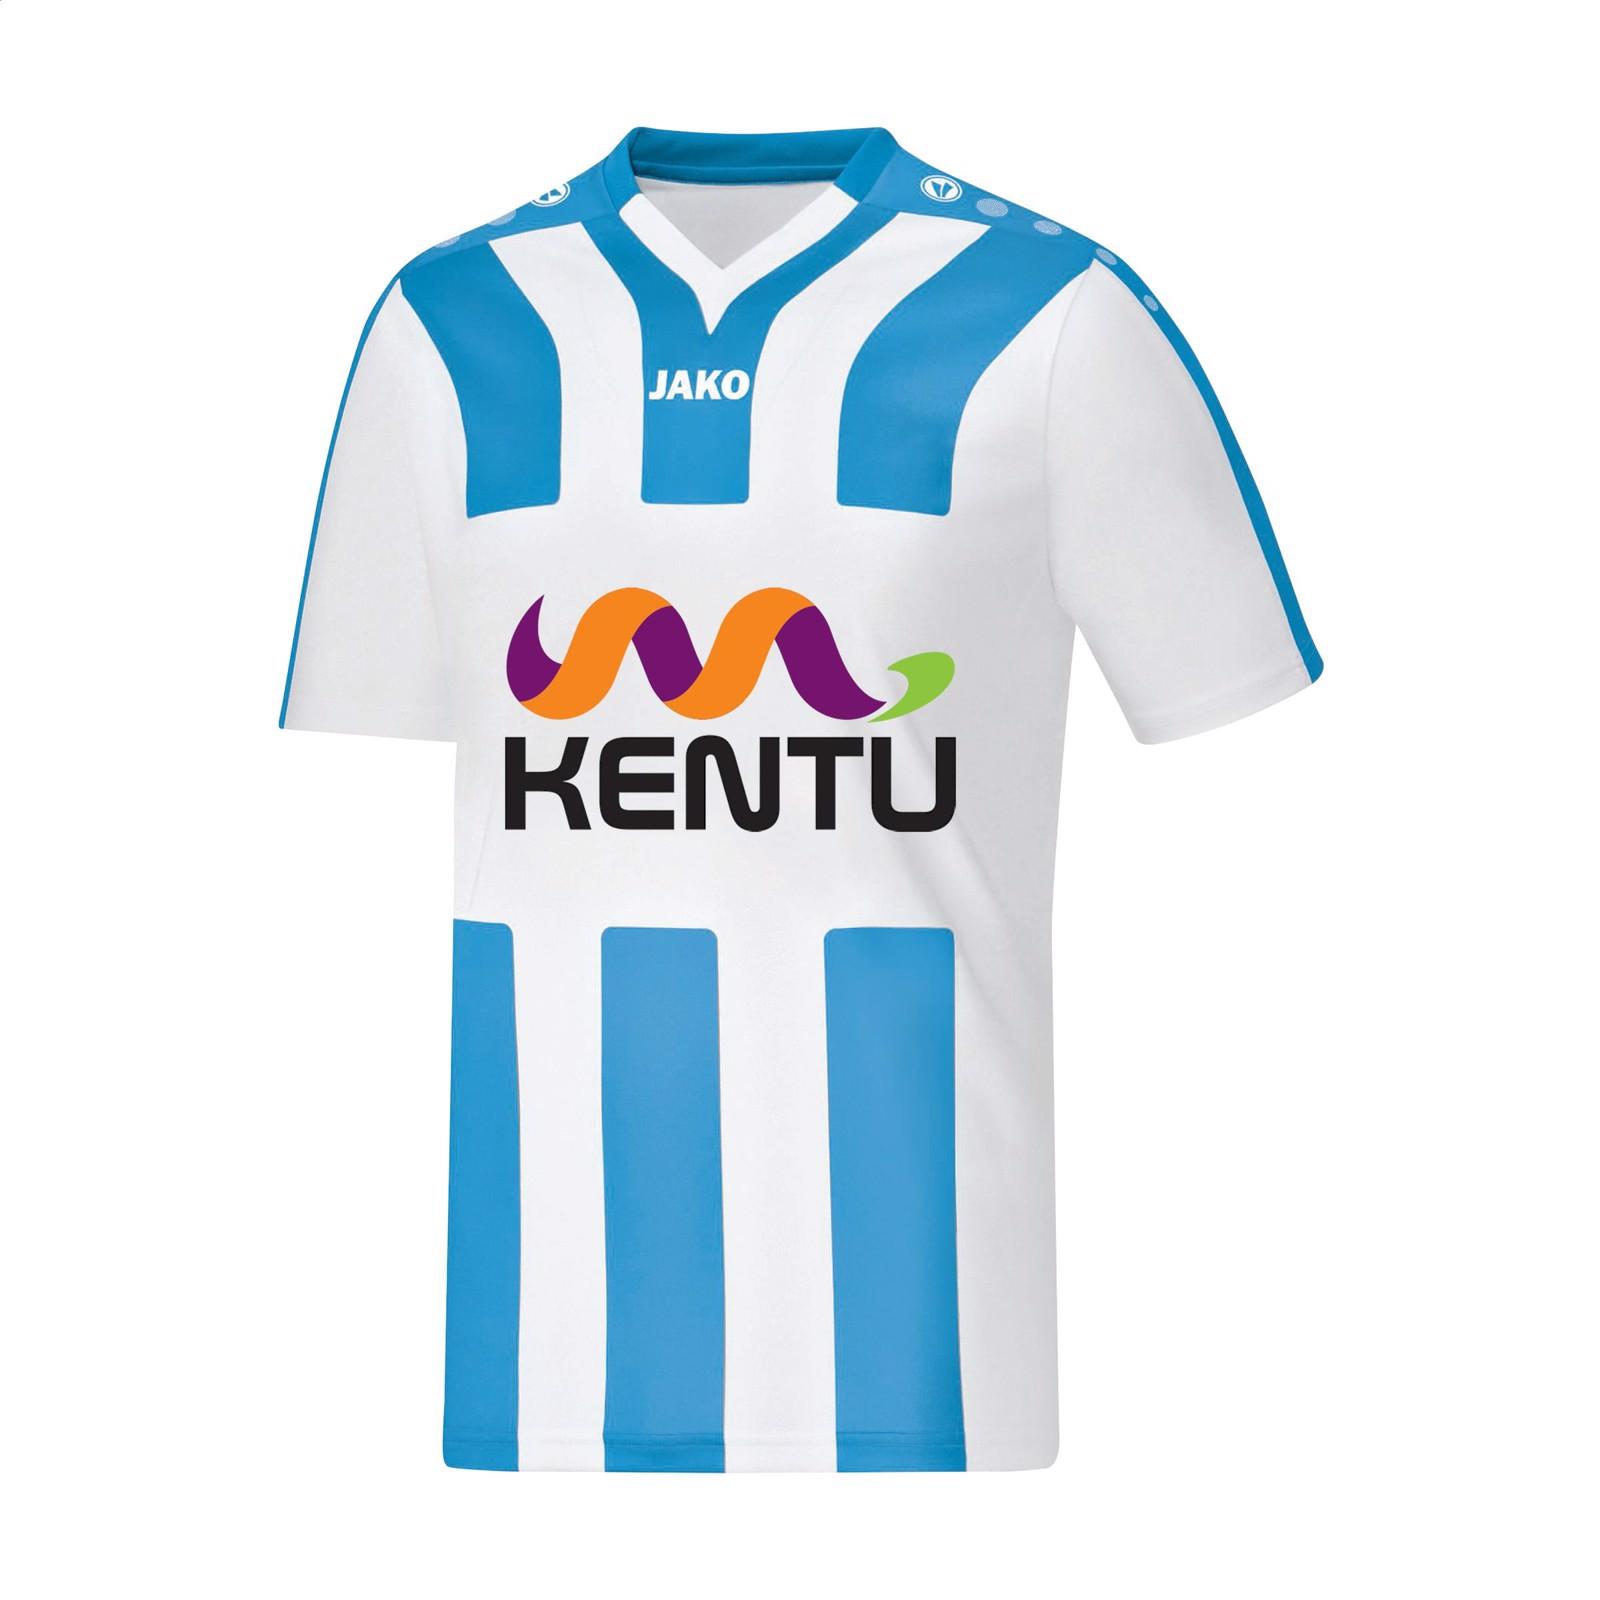 Jako® Shirt Santos KM mens sportshirt - White / Turquoise / S